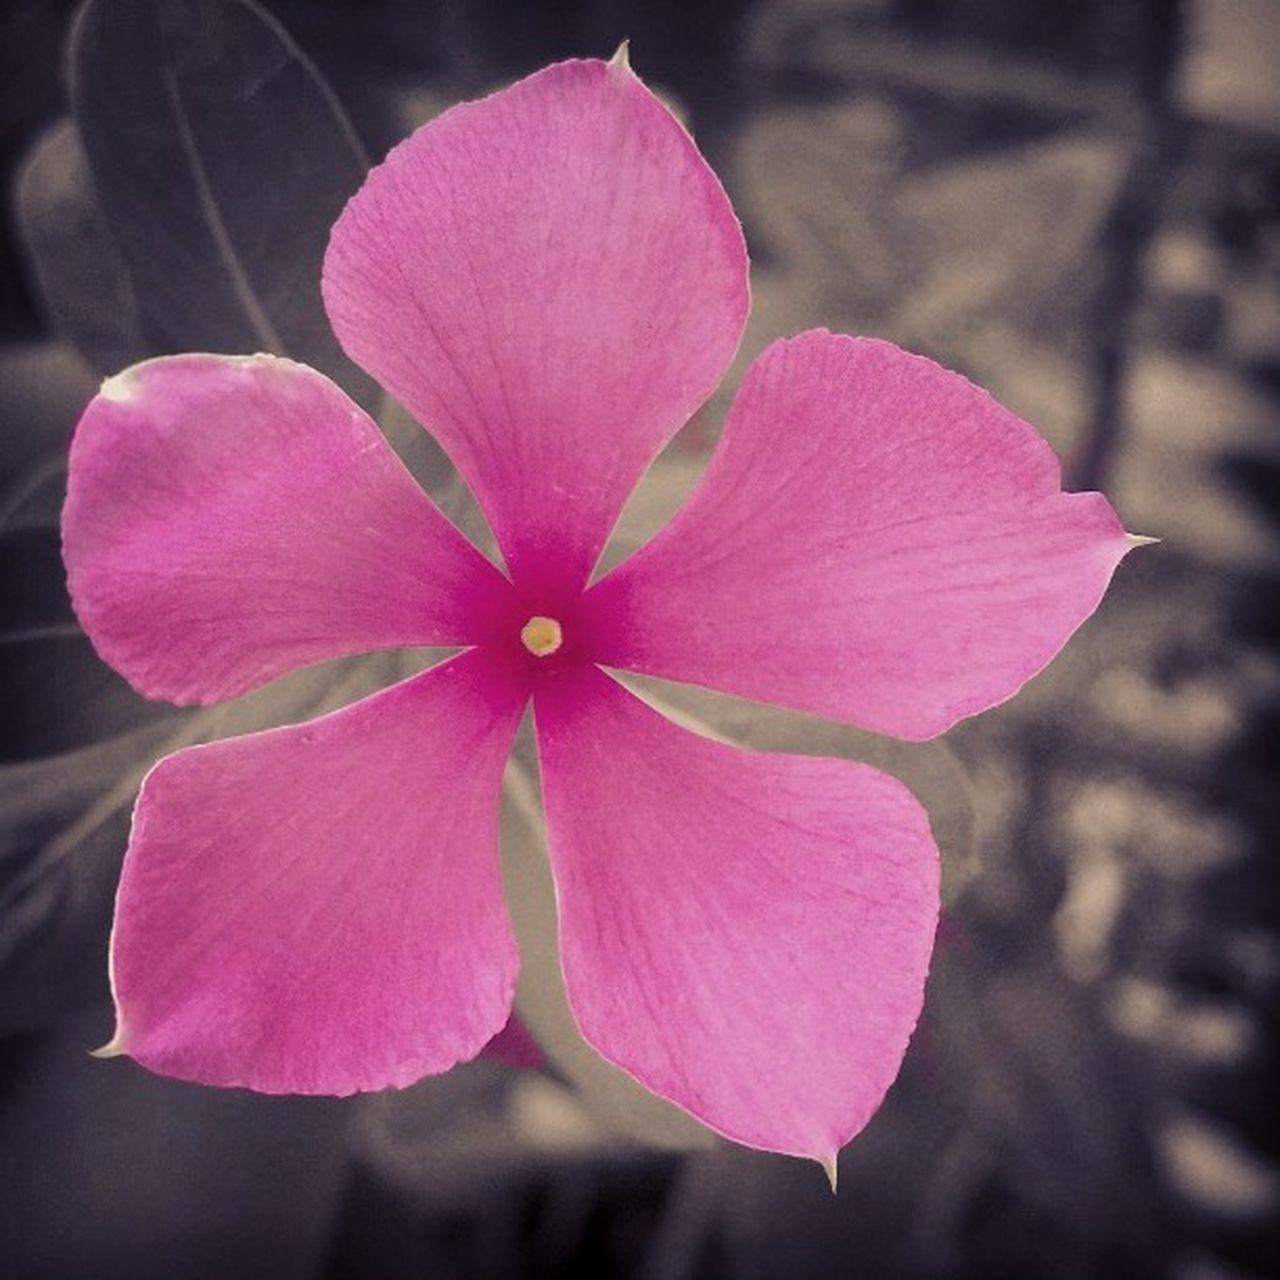 Basicflower Looks_cool Colorpop Nokia_camera Lumia920 Nokia_creative_studio